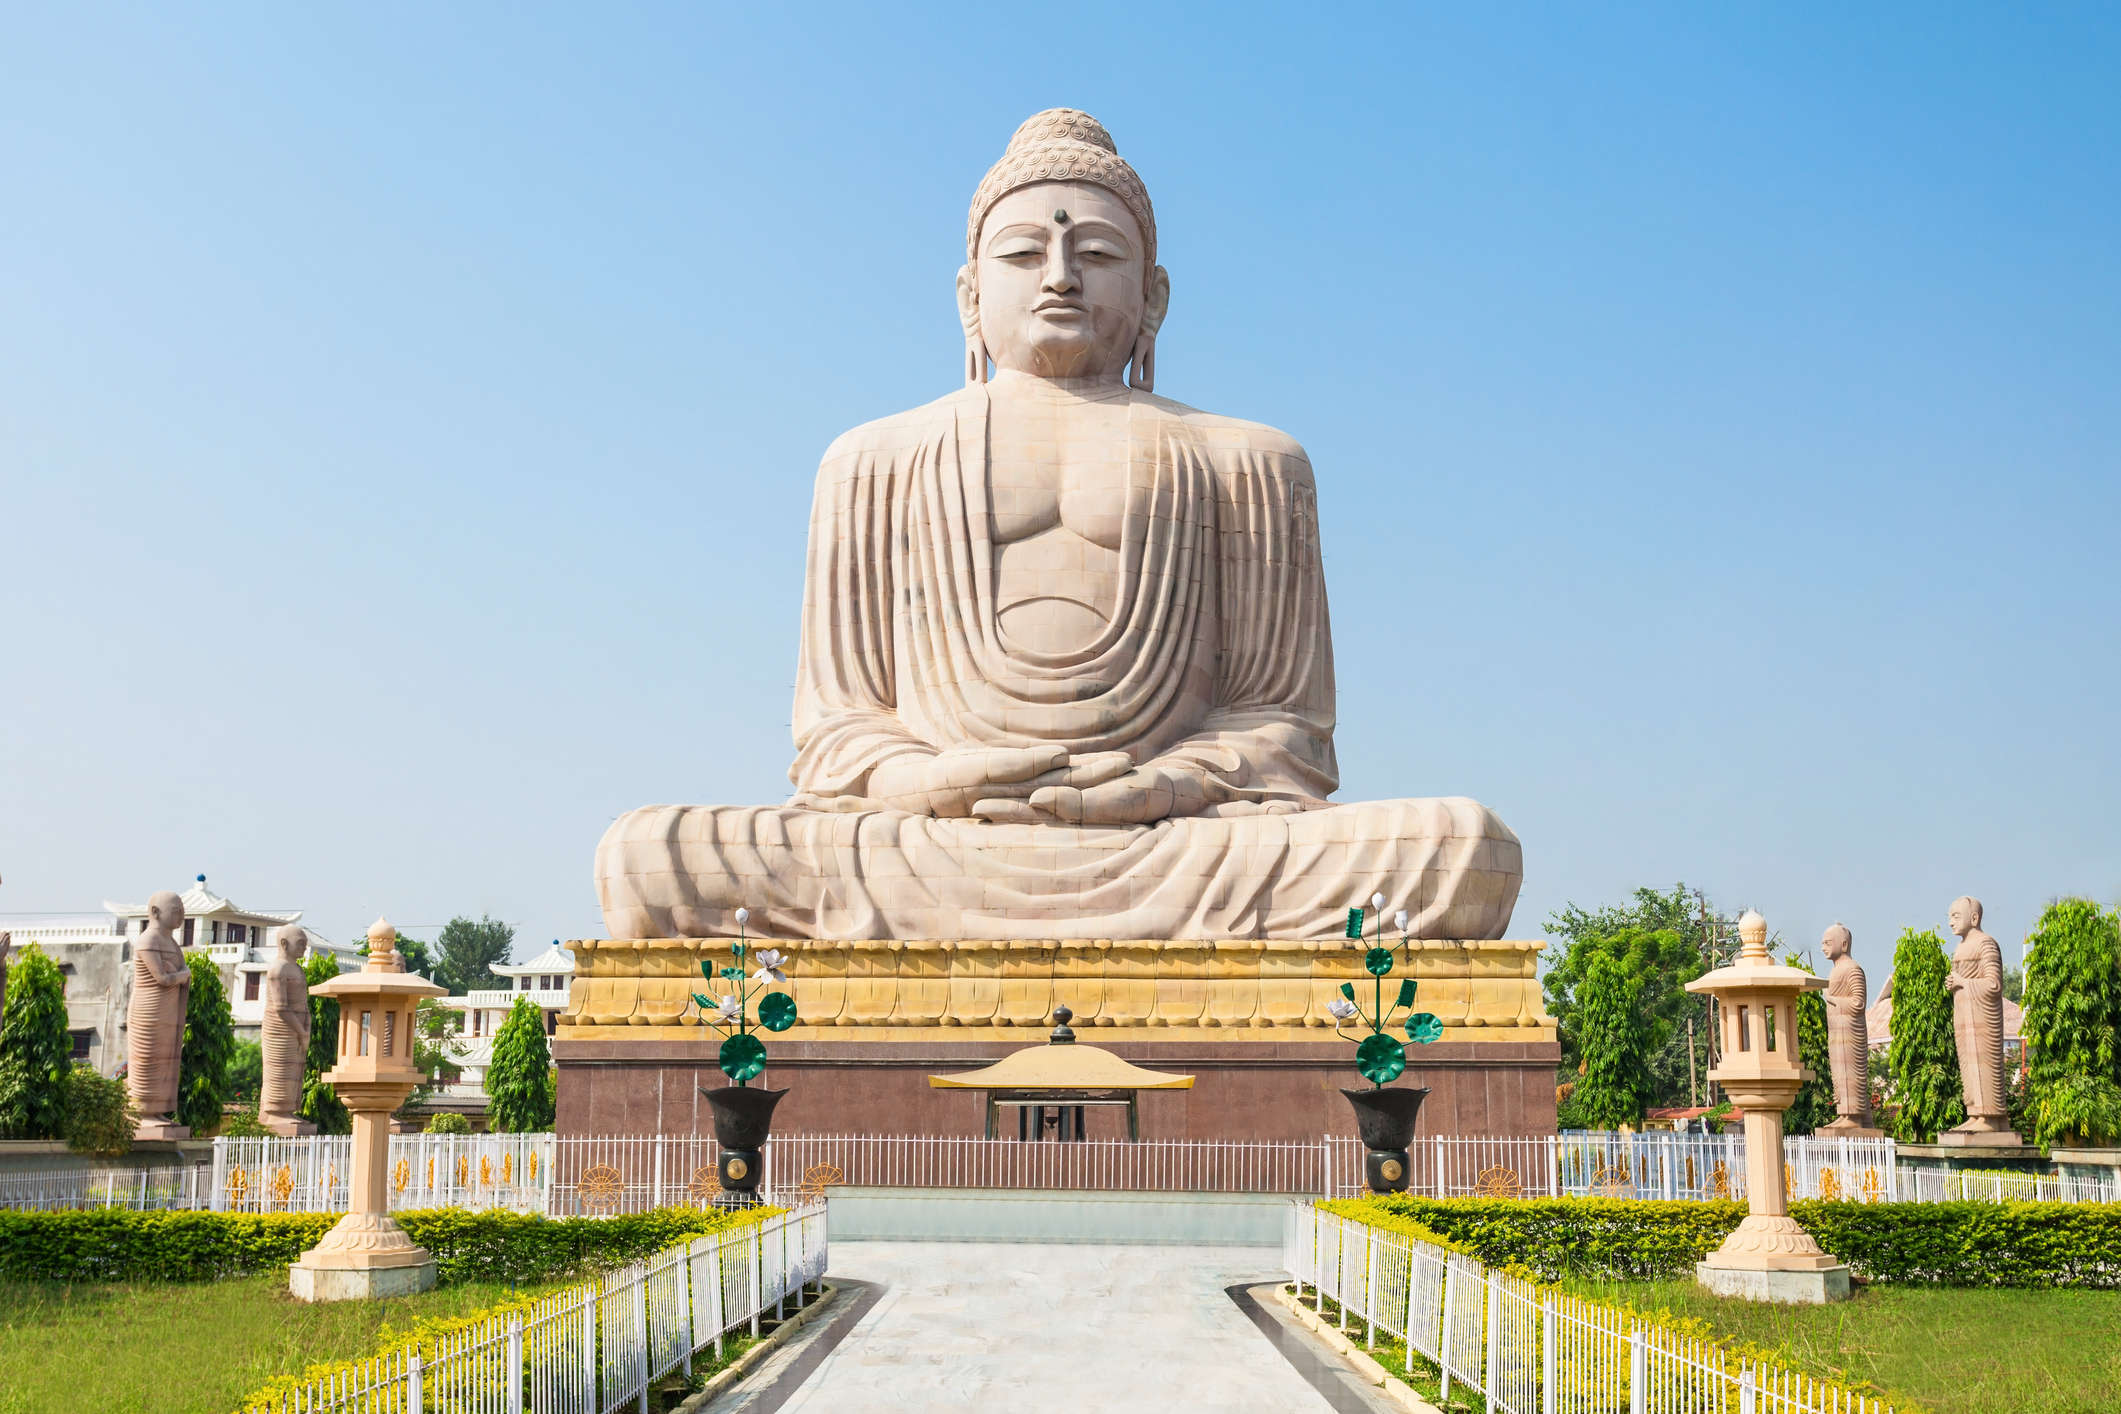 Buddha Purnima—chasing enlightenment on the Buddha trail